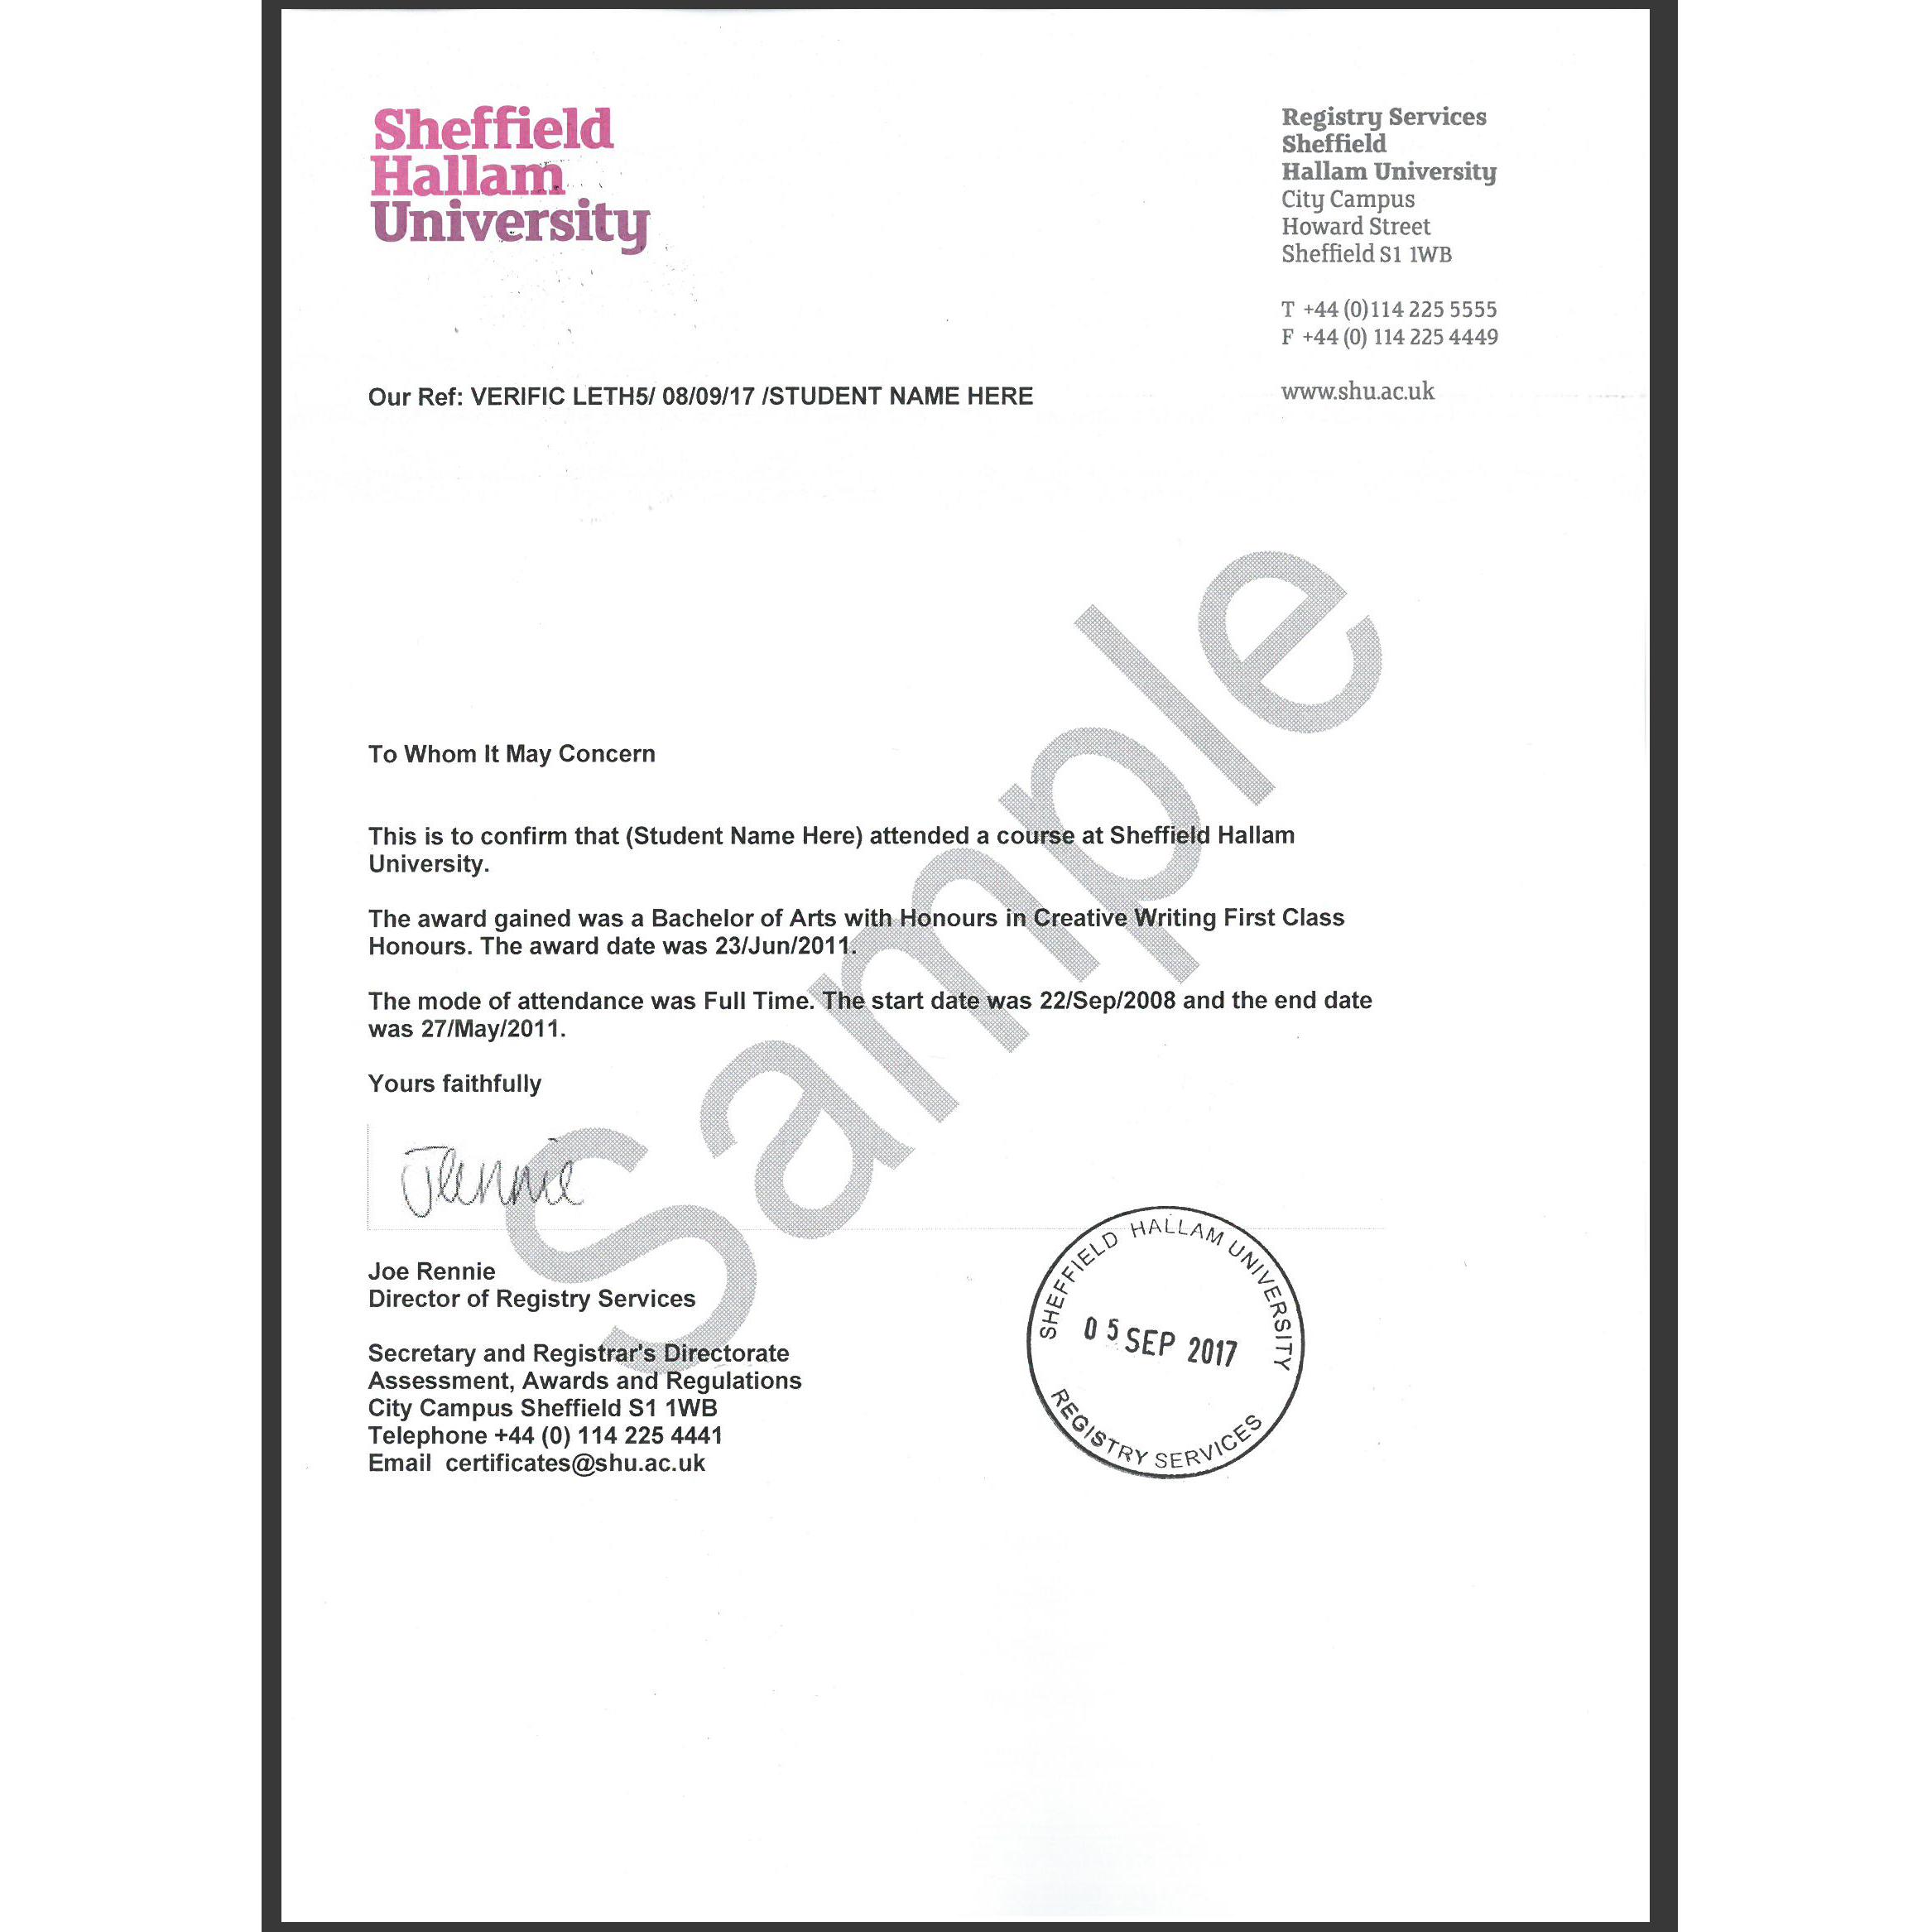 Replacement Award Certificate | Sheffield Hallam University